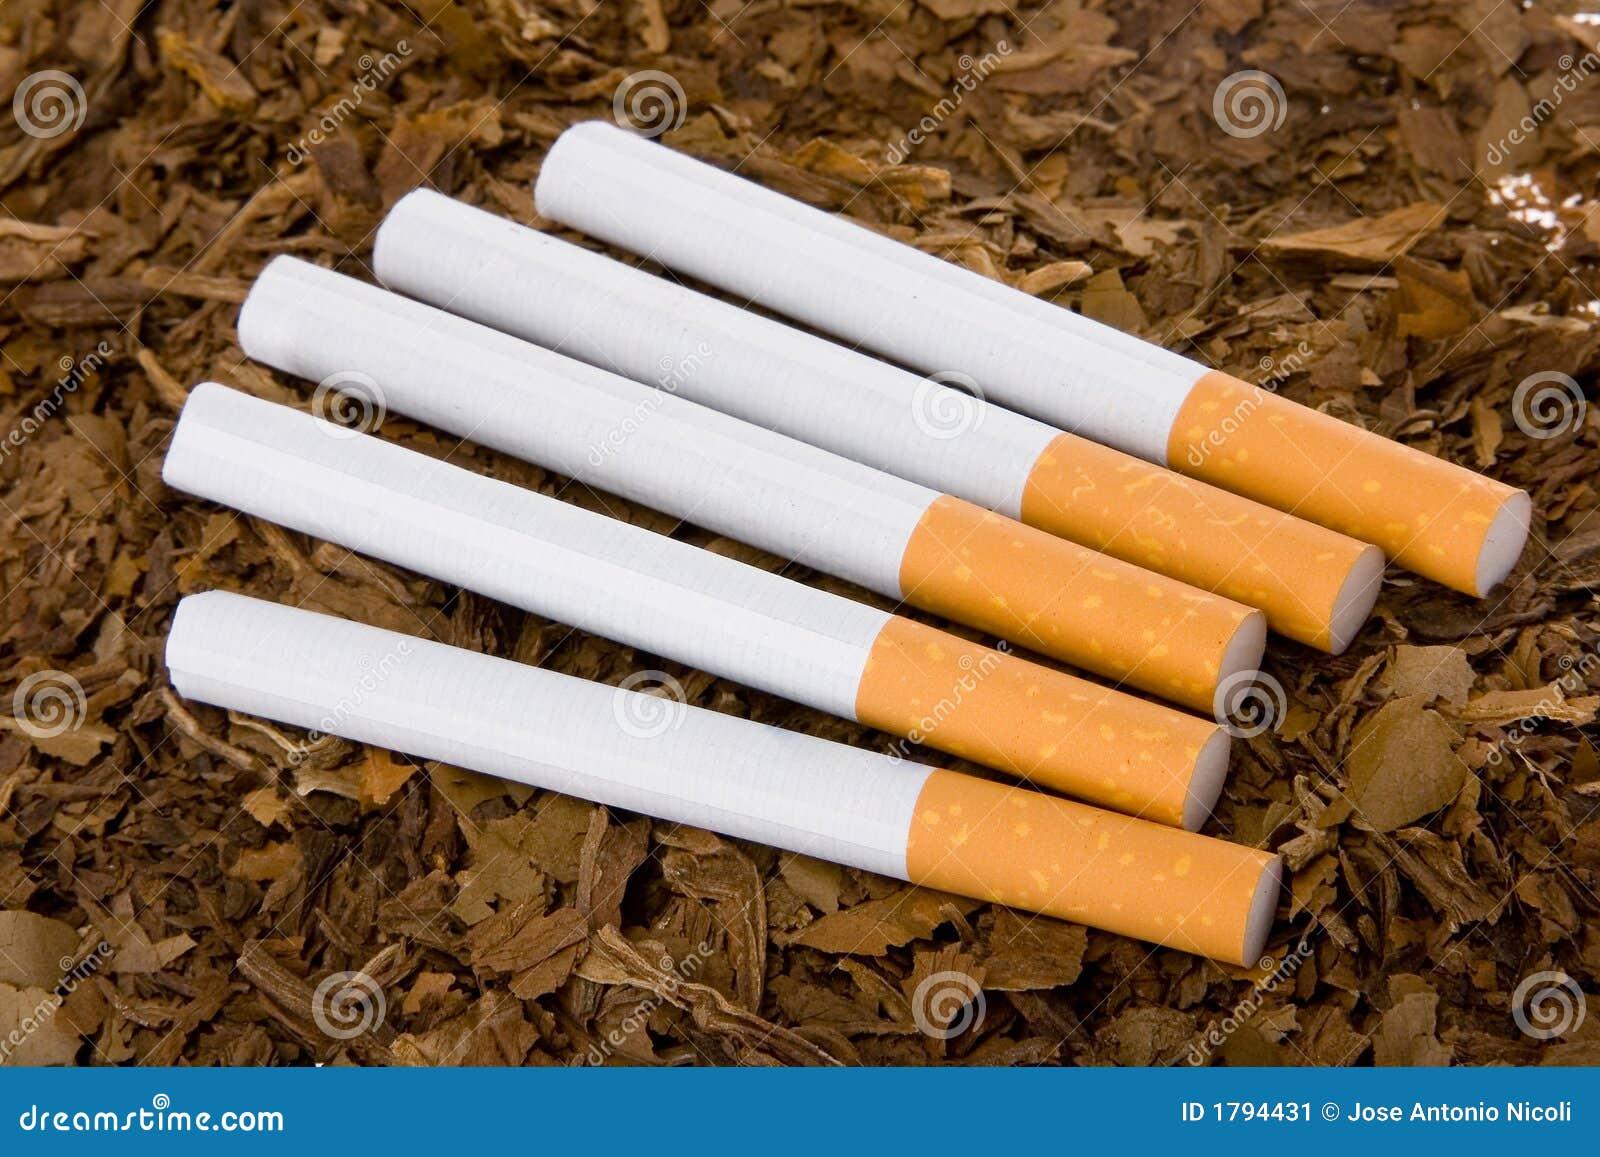 tabak und zigaretten 3 stockbild bild von lebensstil 1794431. Black Bedroom Furniture Sets. Home Design Ideas